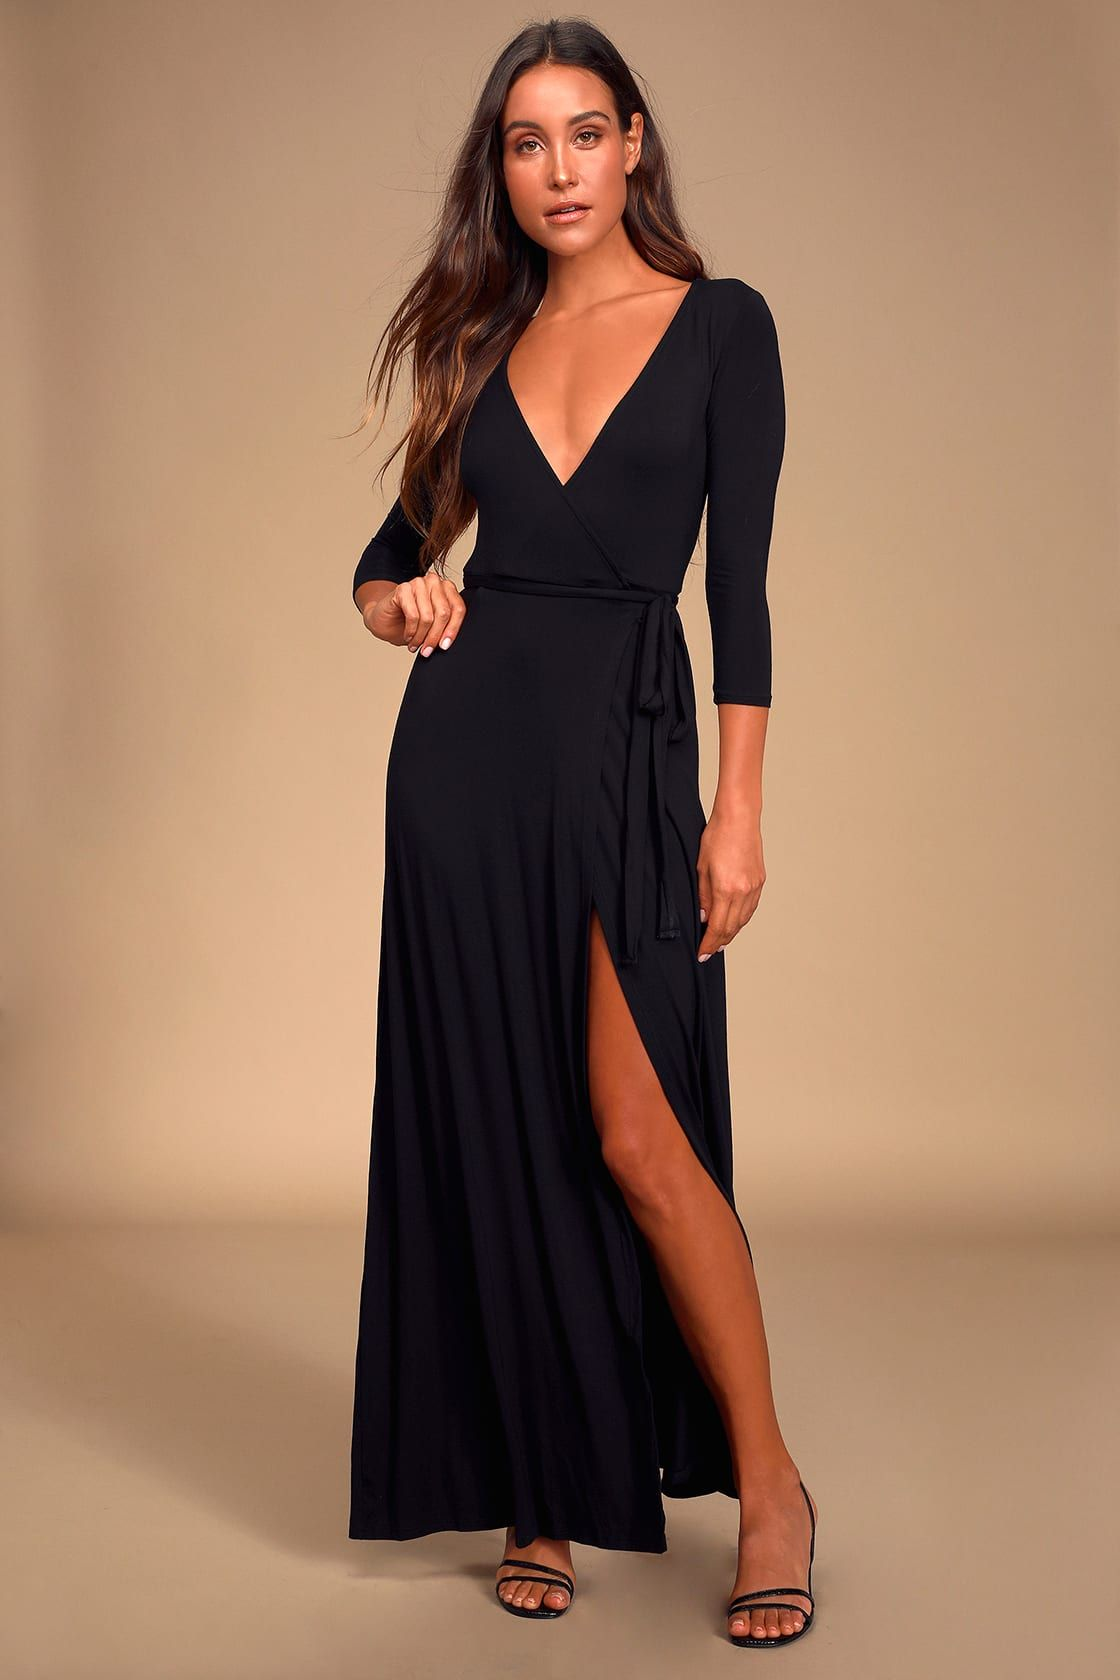 Garden District Black Wrap Maxi Dress Maxi Dress Satin Skater Dress Maxi Wrap Dress [ 1680 x 1120 Pixel ]